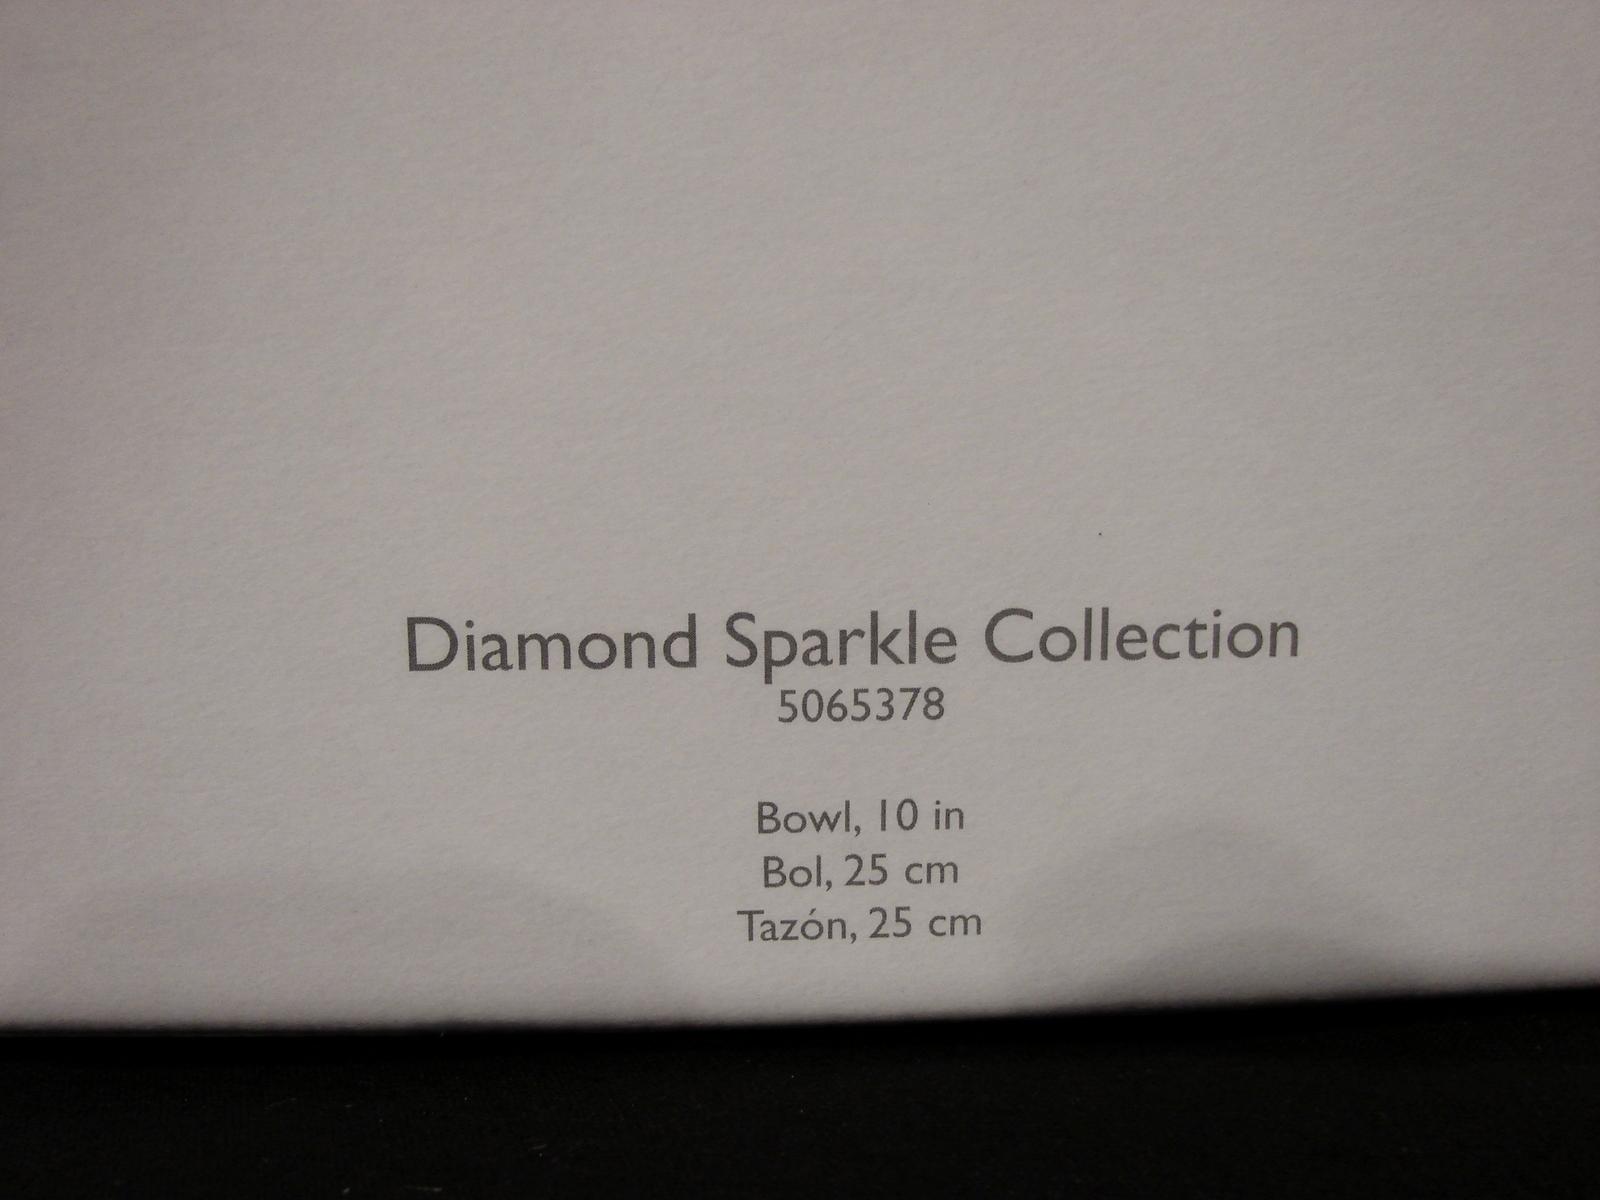 Mikasa Crystal 10 Inch Diamond Sparkle Square Bowl NIB image 3